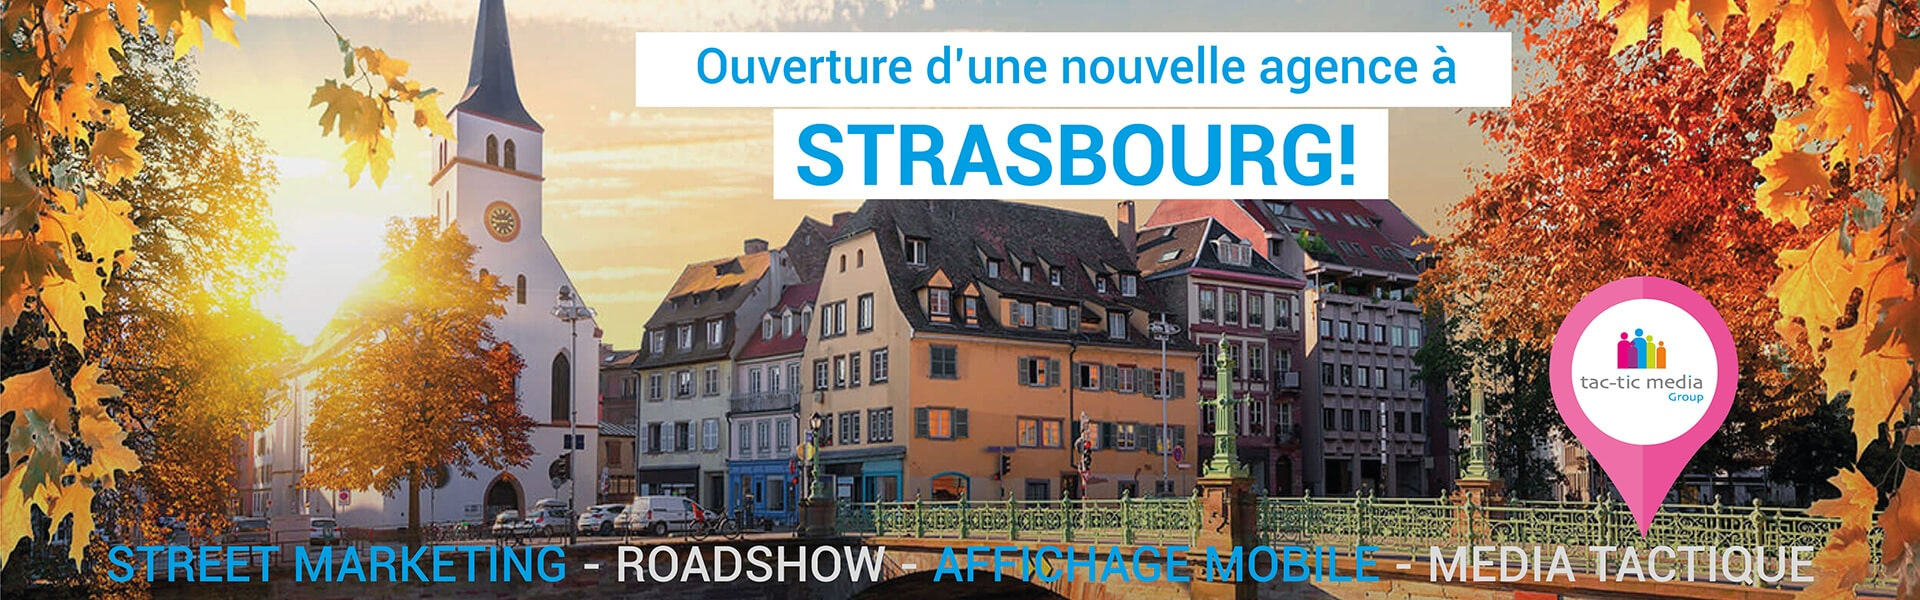 Tac-tic media ouvre une nouvelle agence à Strasbourg